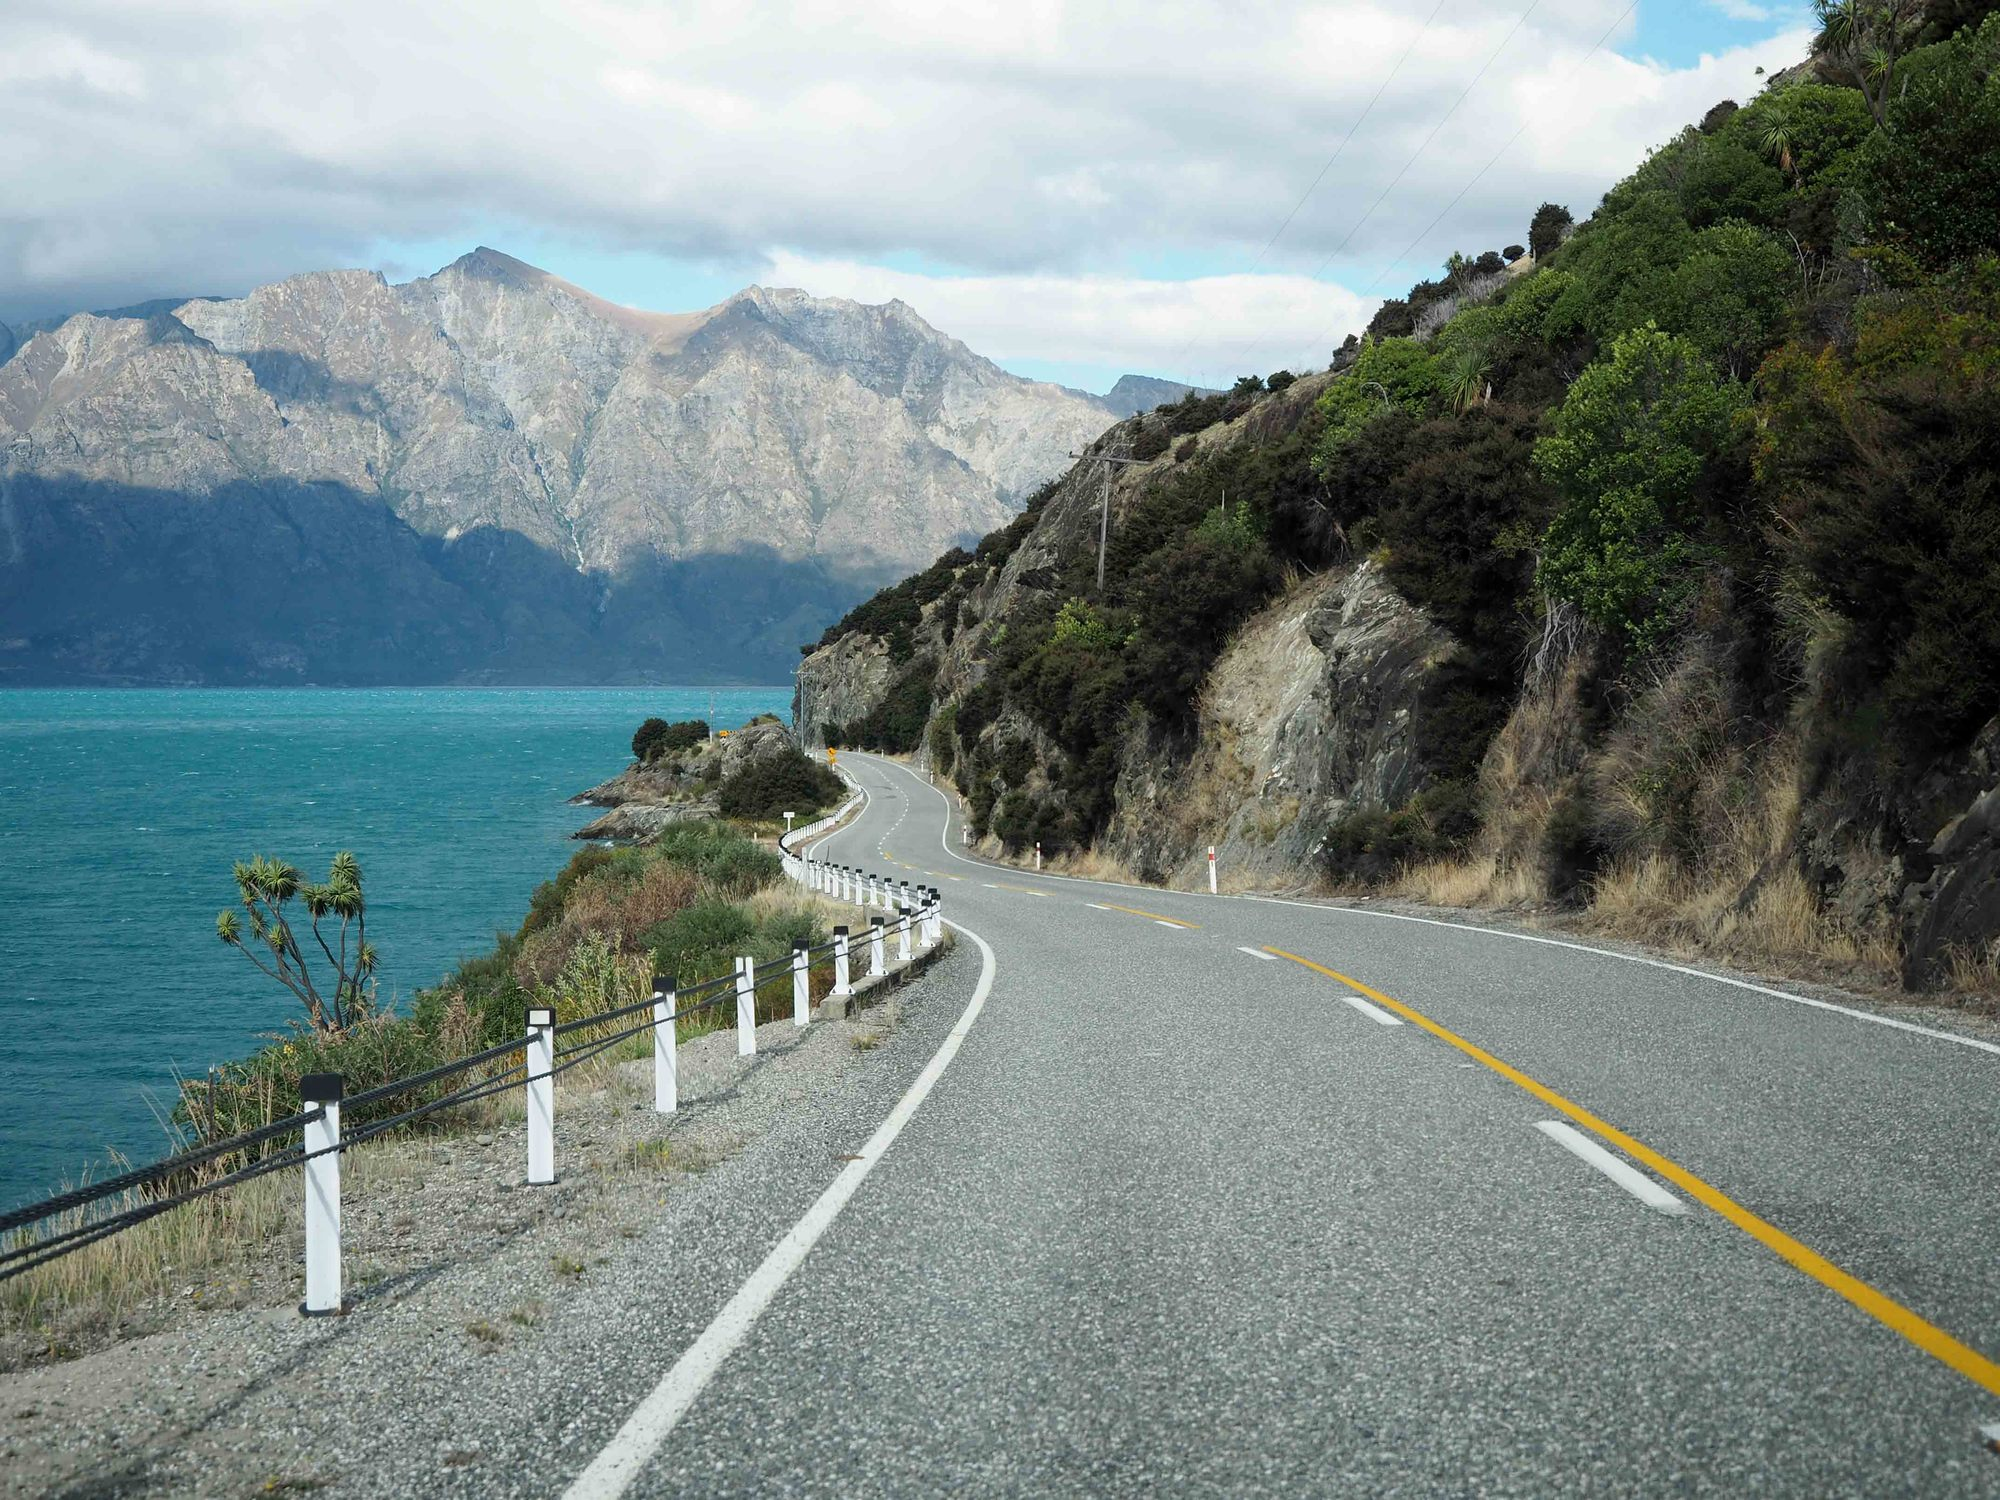 New Zealand roads